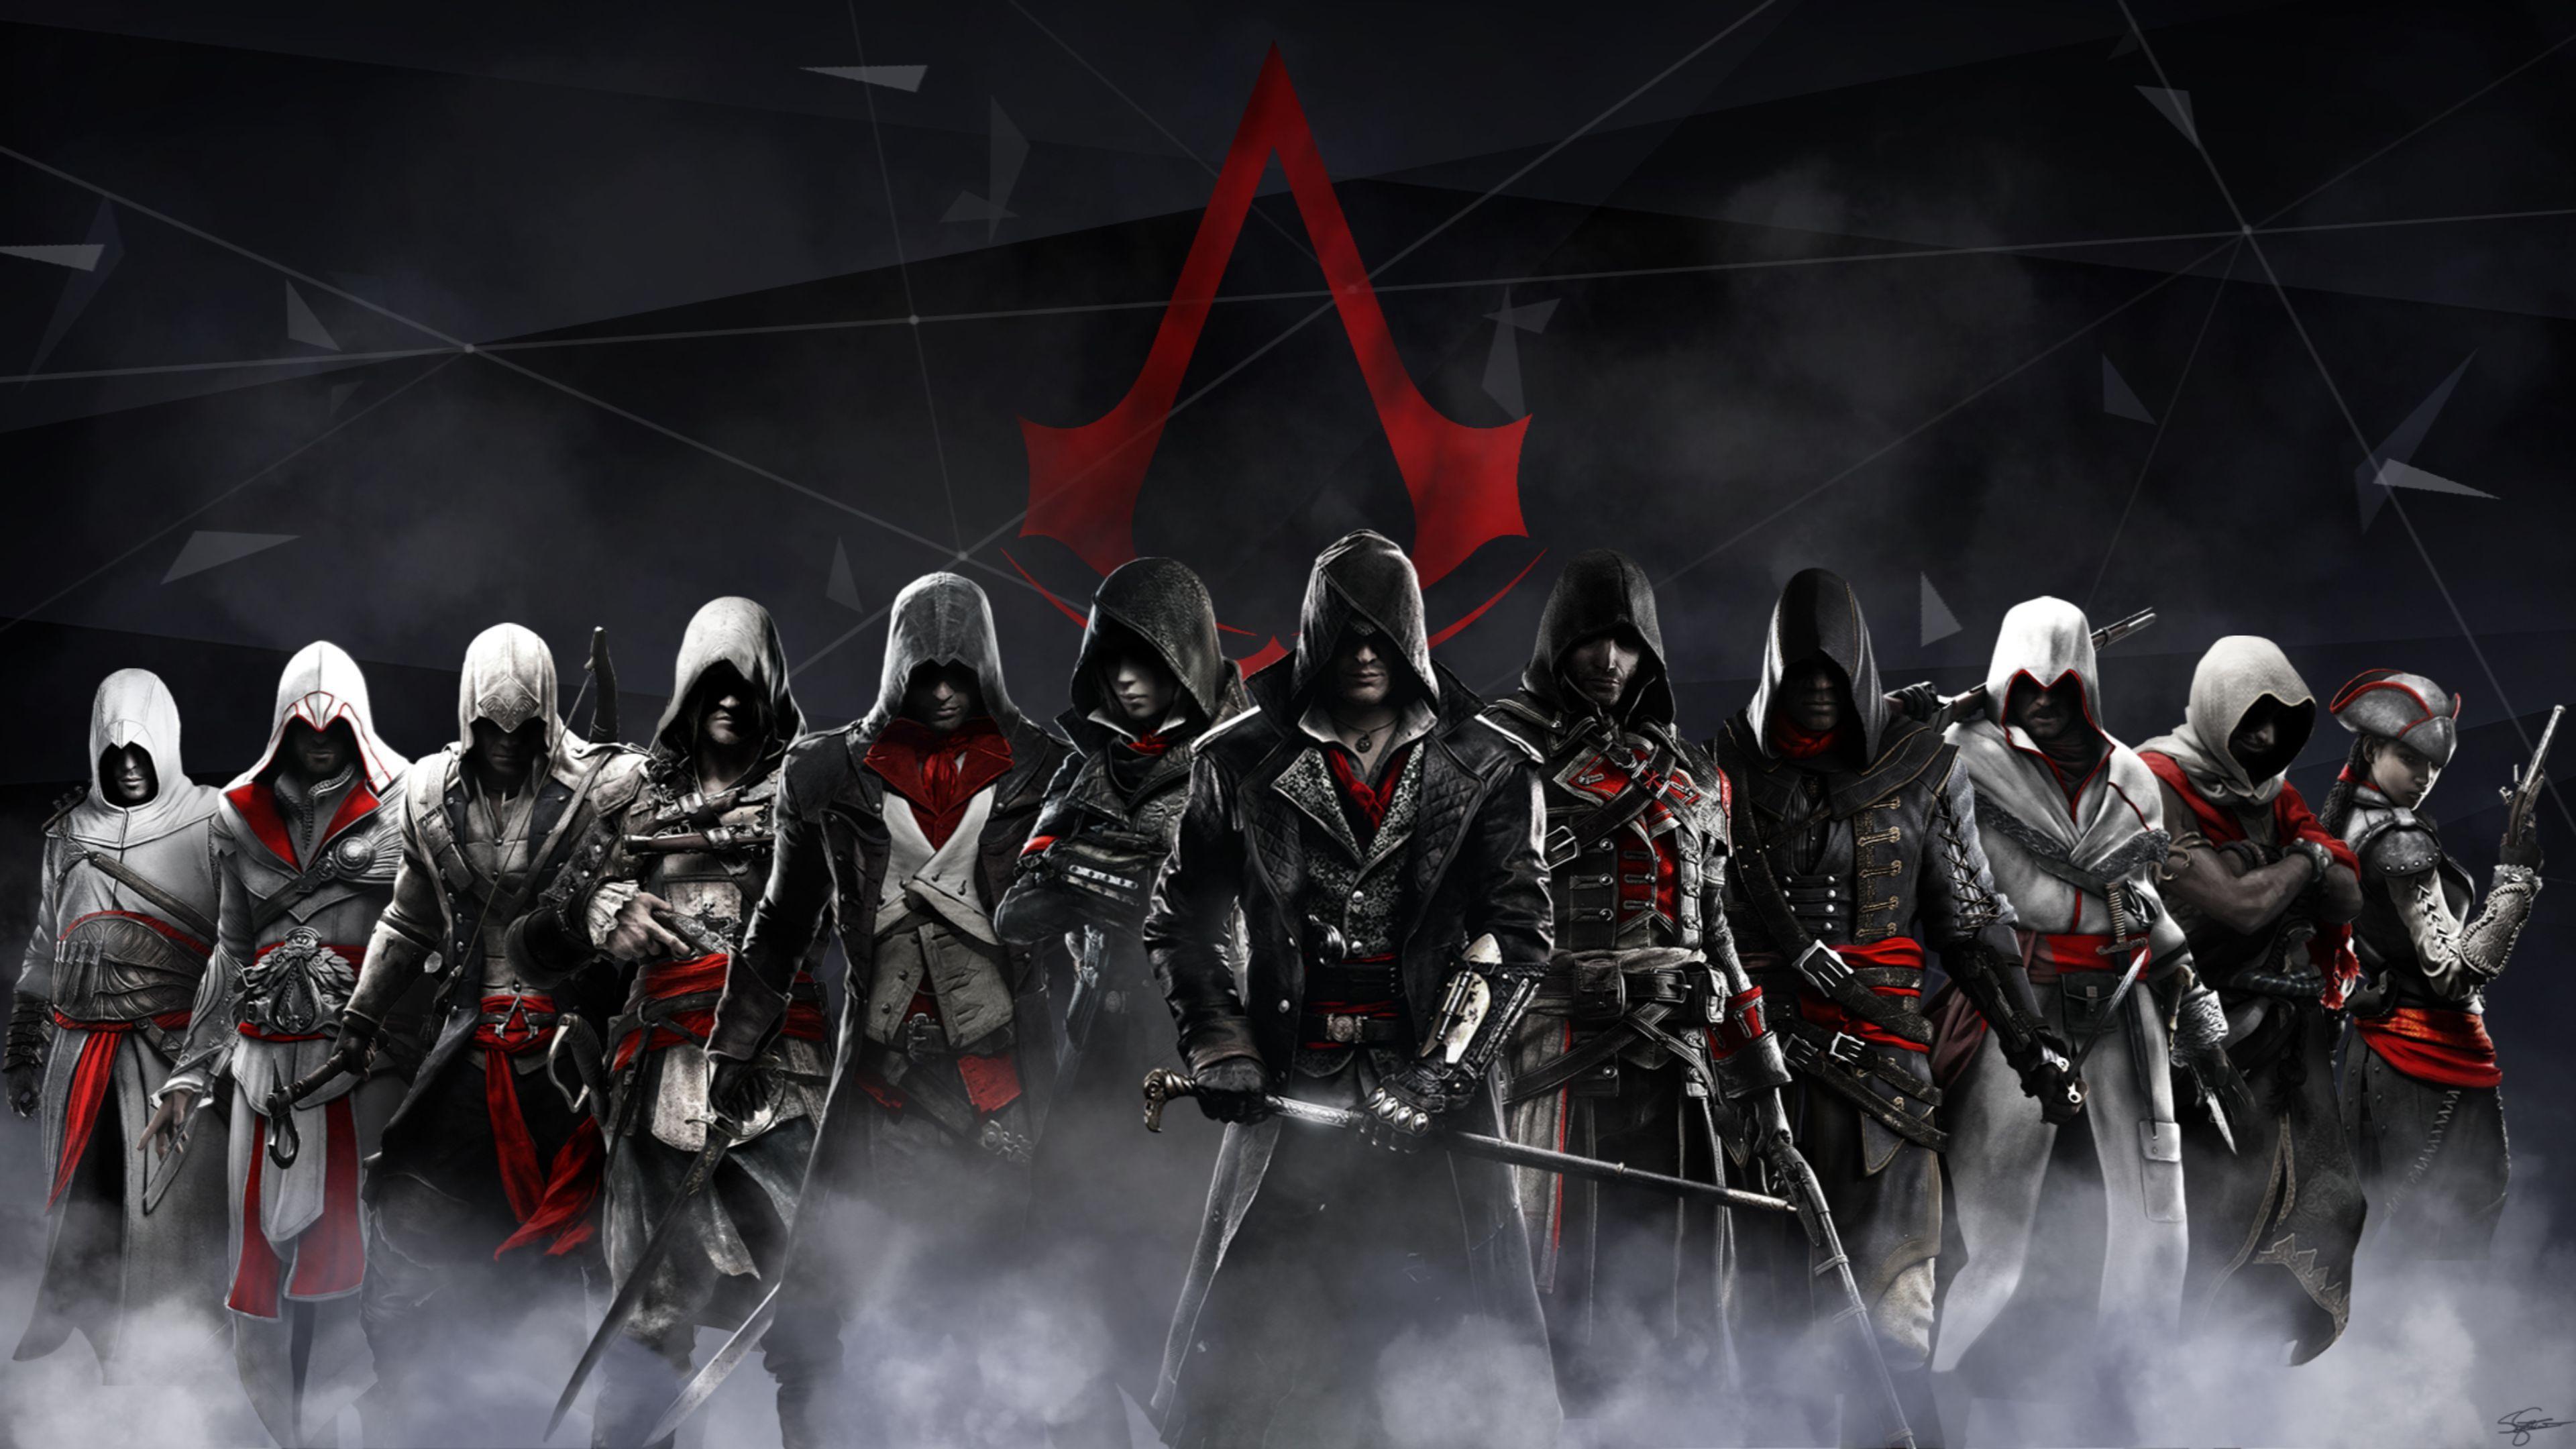 Assassins Creed Syndicate 4k Logo wallpaper Fondos de